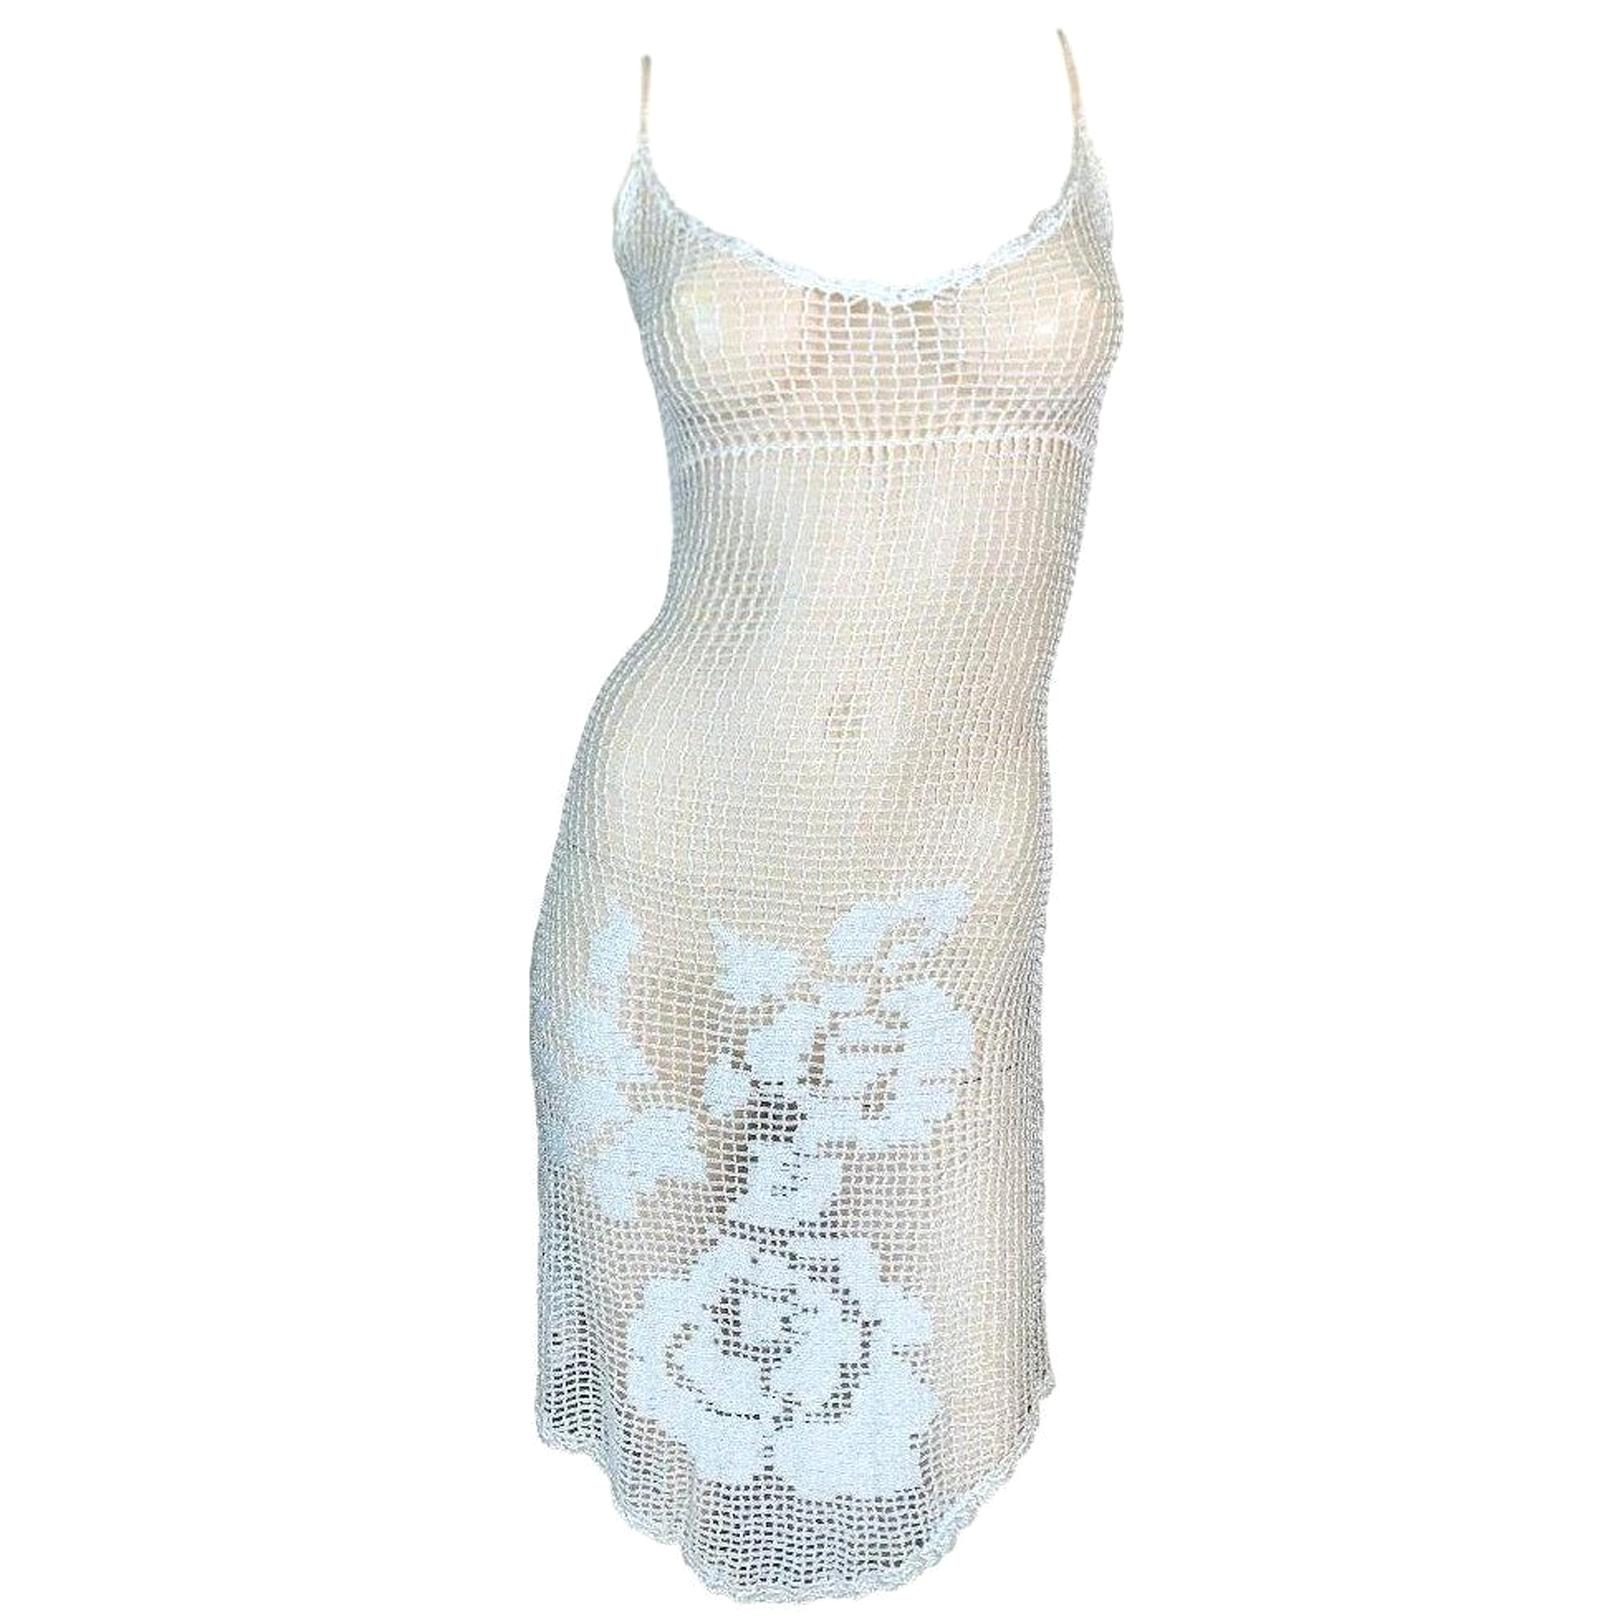 Vintage F/W 1997 Dolce & Gabbana Runway Sheer White Knit Dress